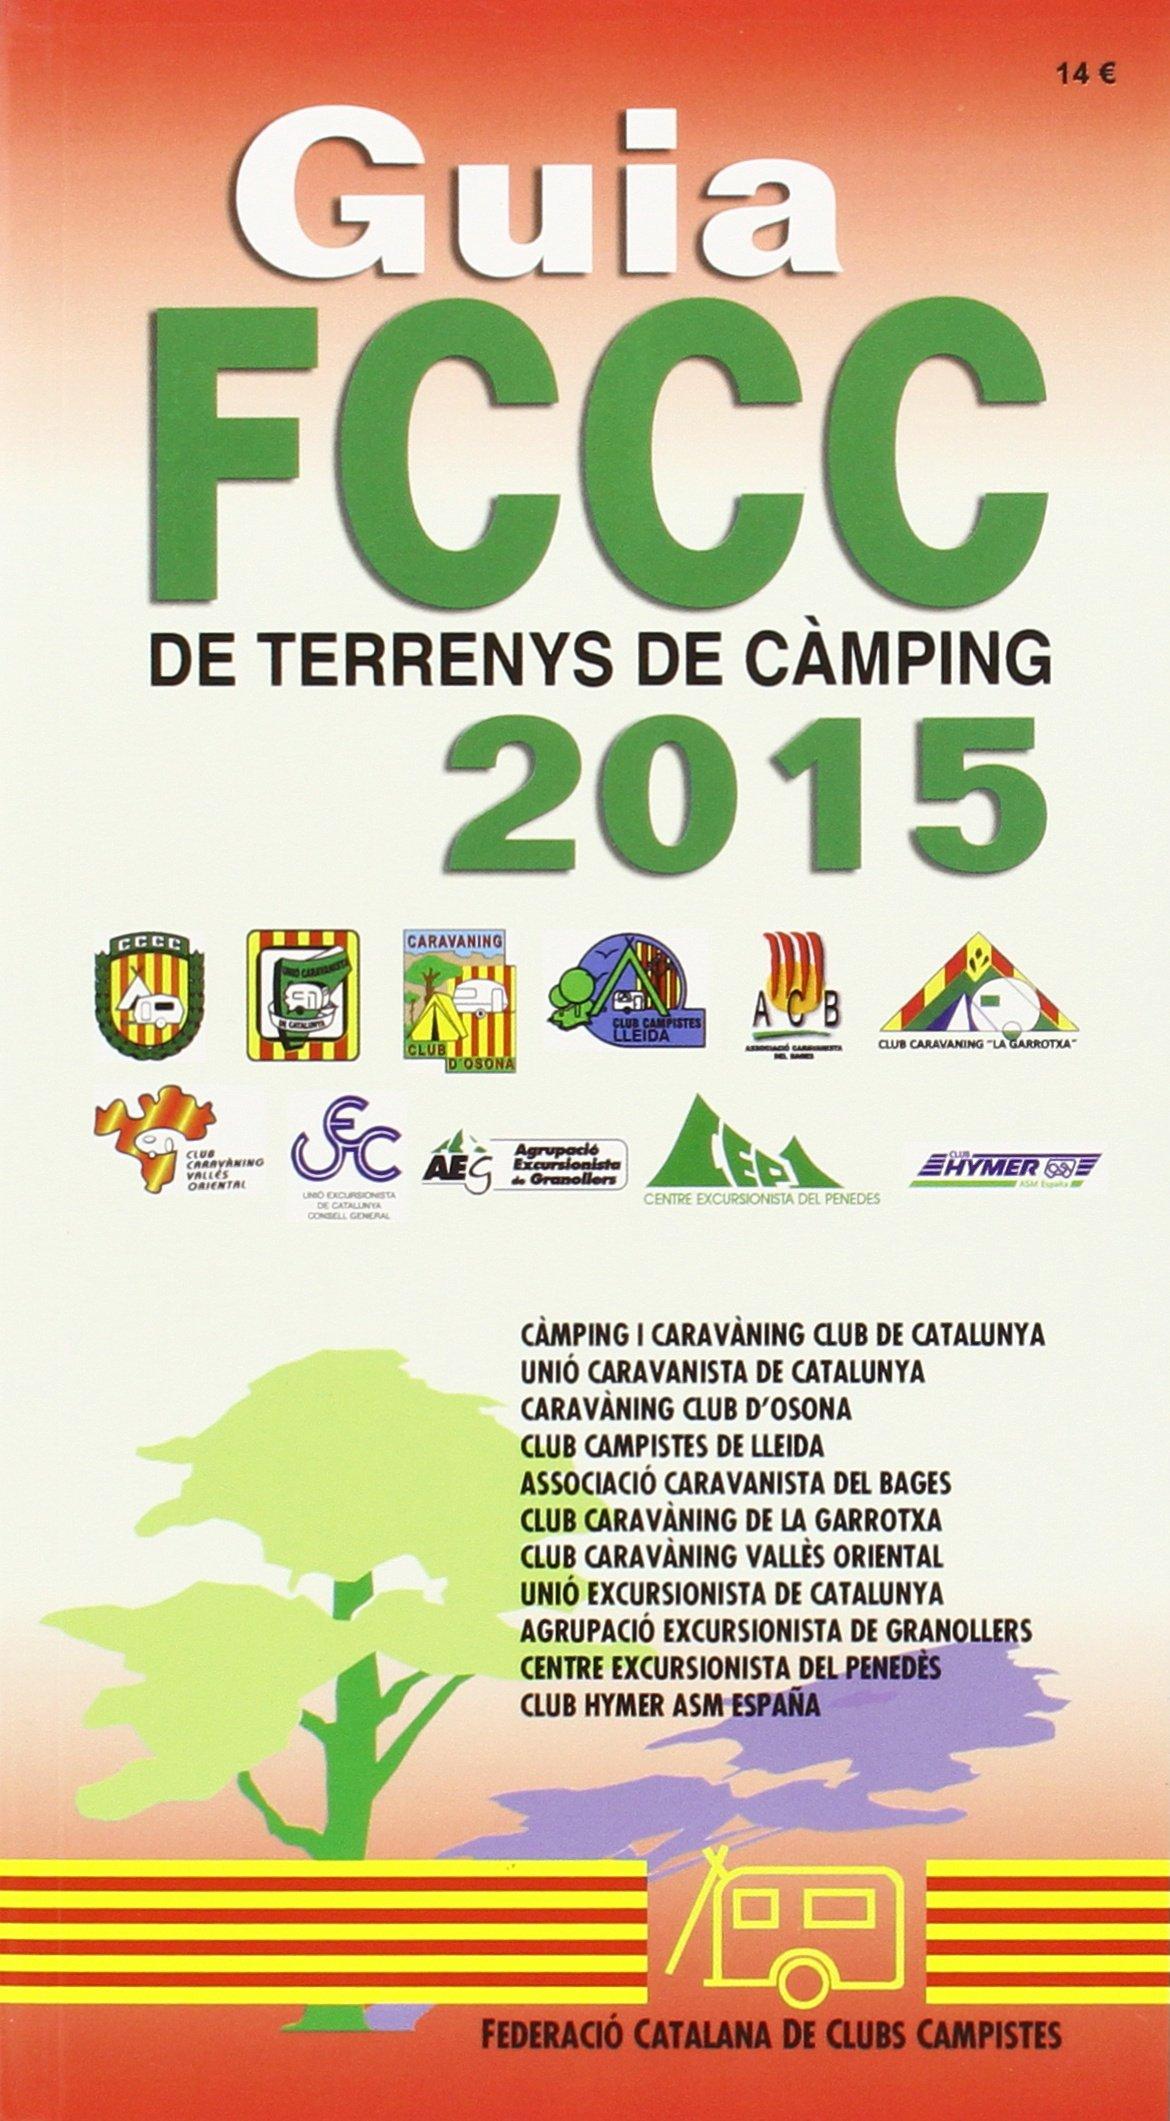 Guia FCCC De Terrenys De Camping. 2015: Amazon.es: Vv.Aa.: Libros